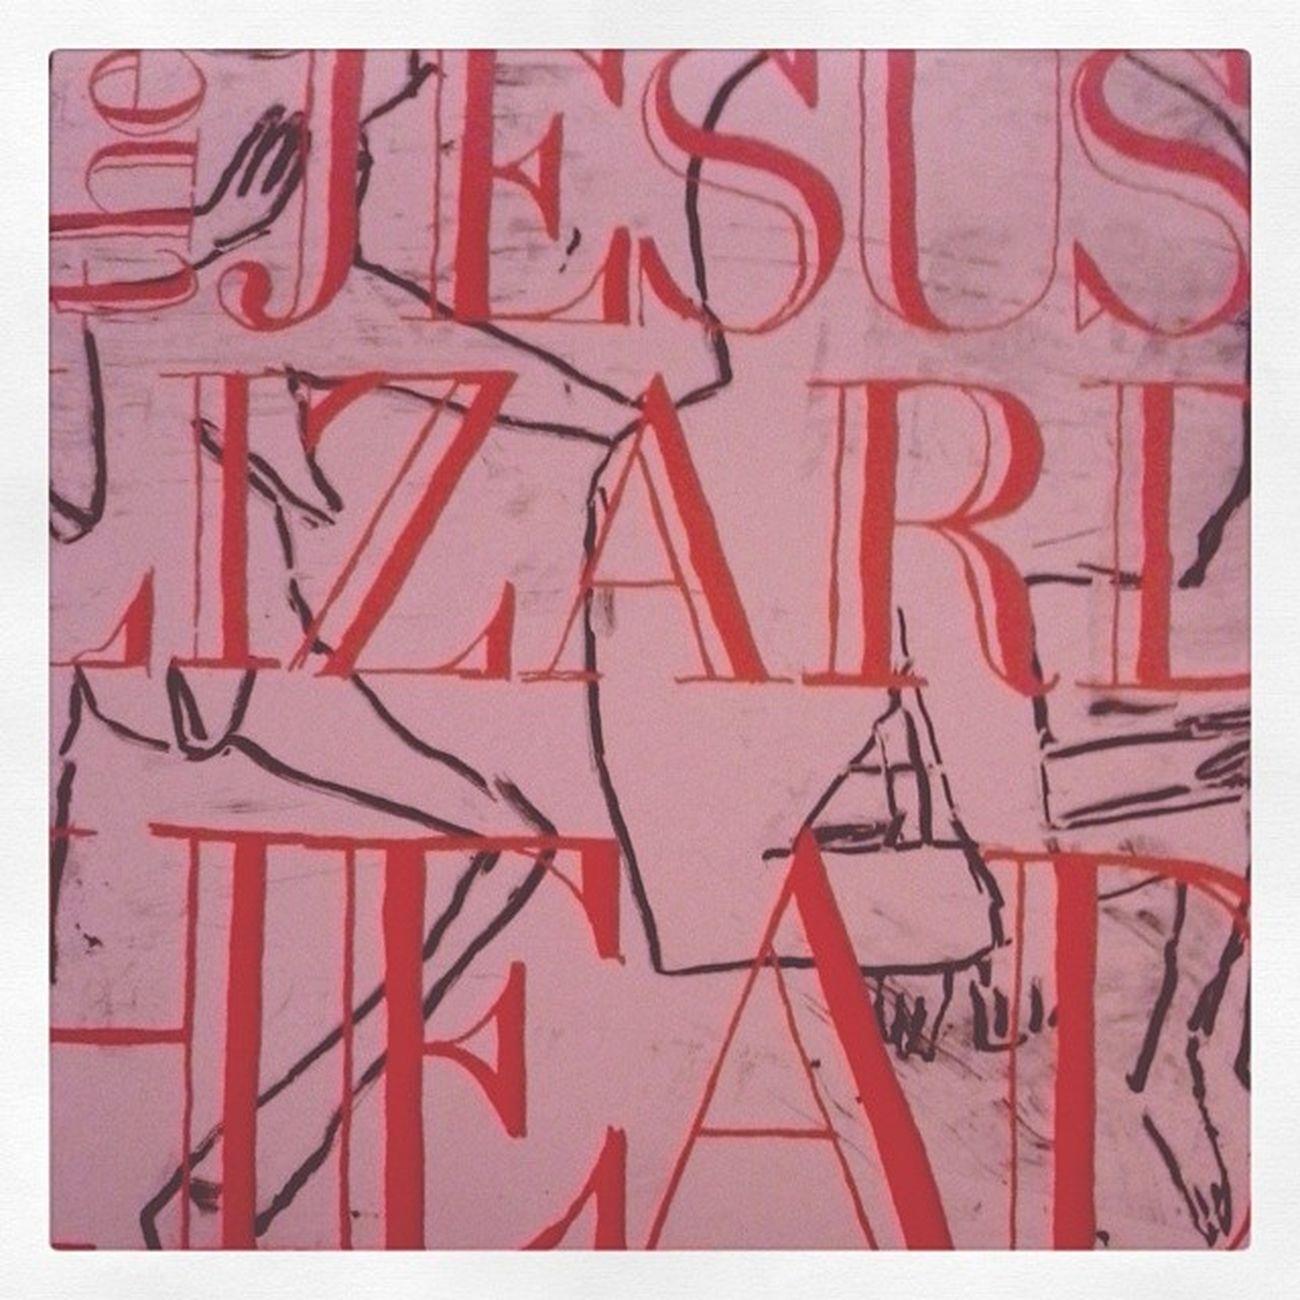 Thejesuslizard HEAD Music Album punk